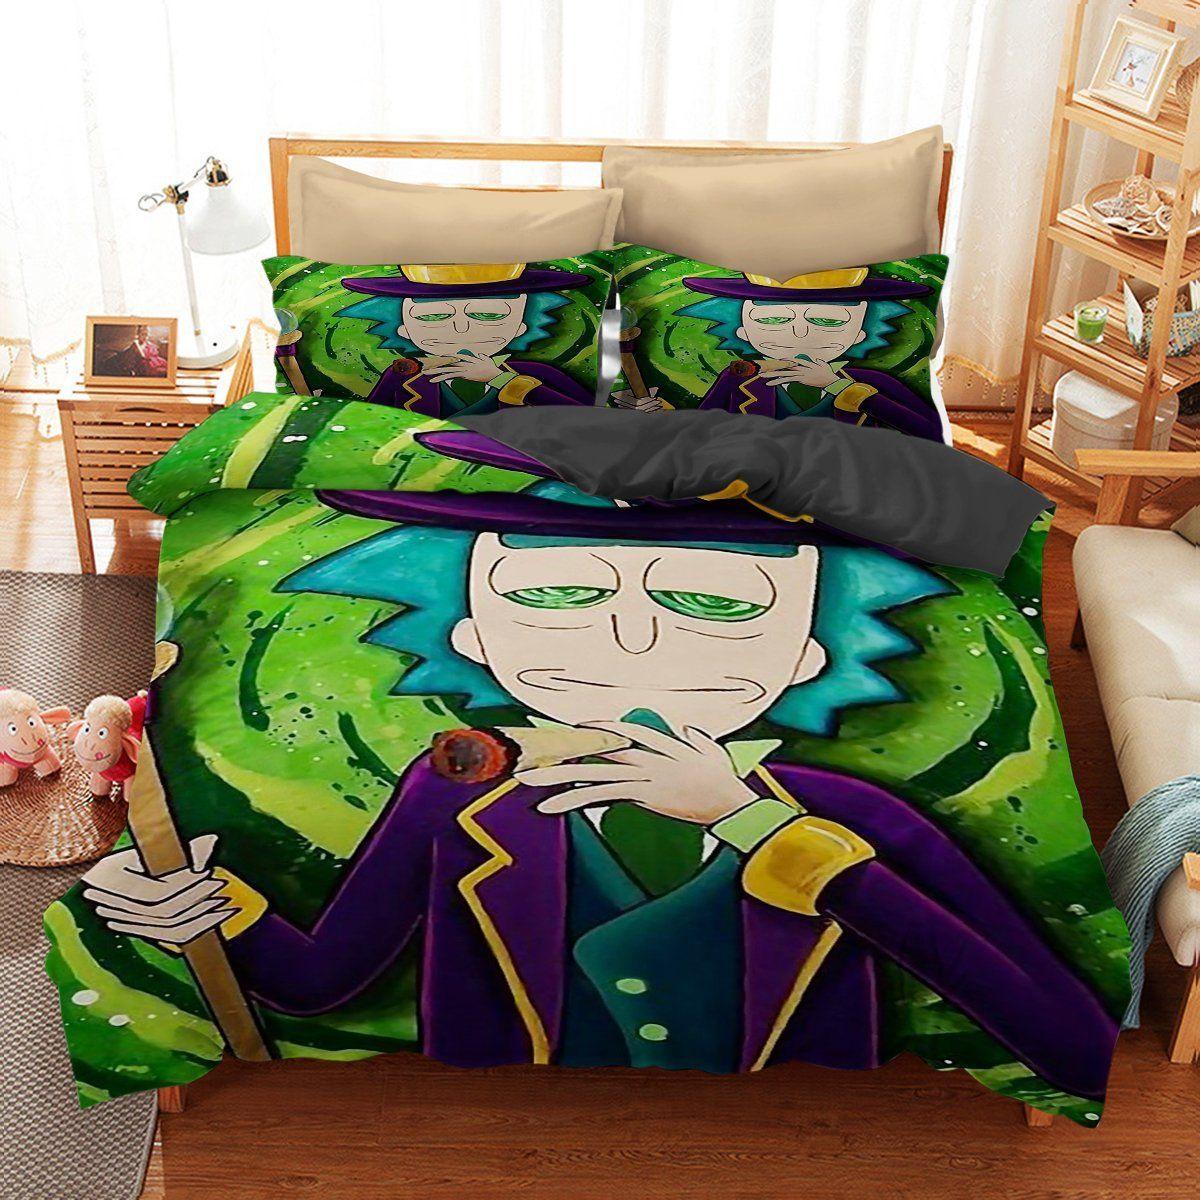 Bedding set rick and morty funny gift idea bedding set